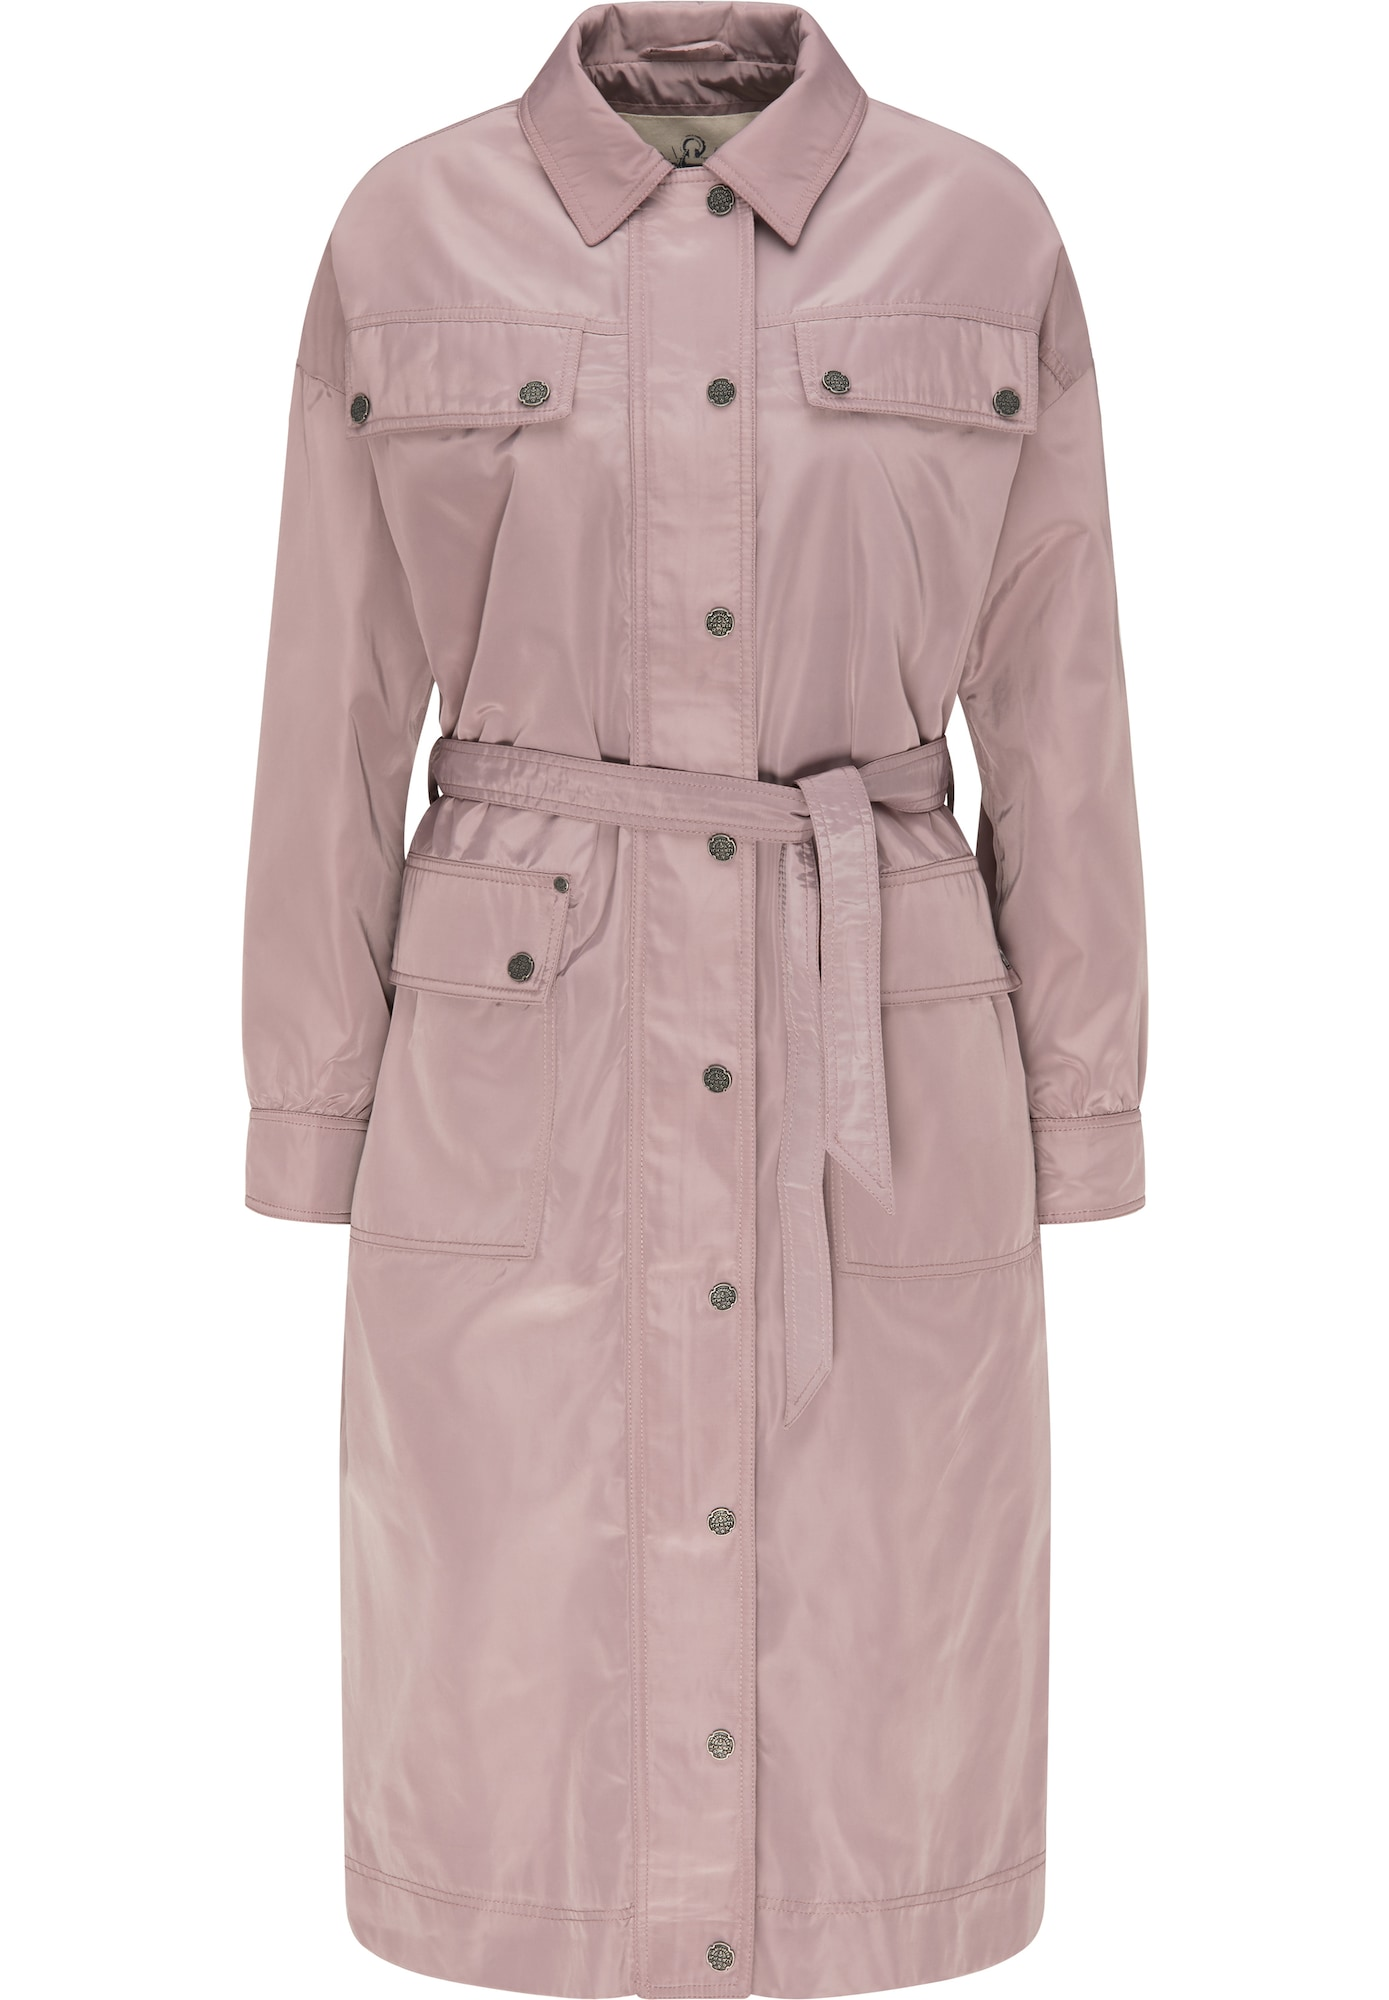 DreiMaster Vintage Demisezoninis paltas kūno spalva